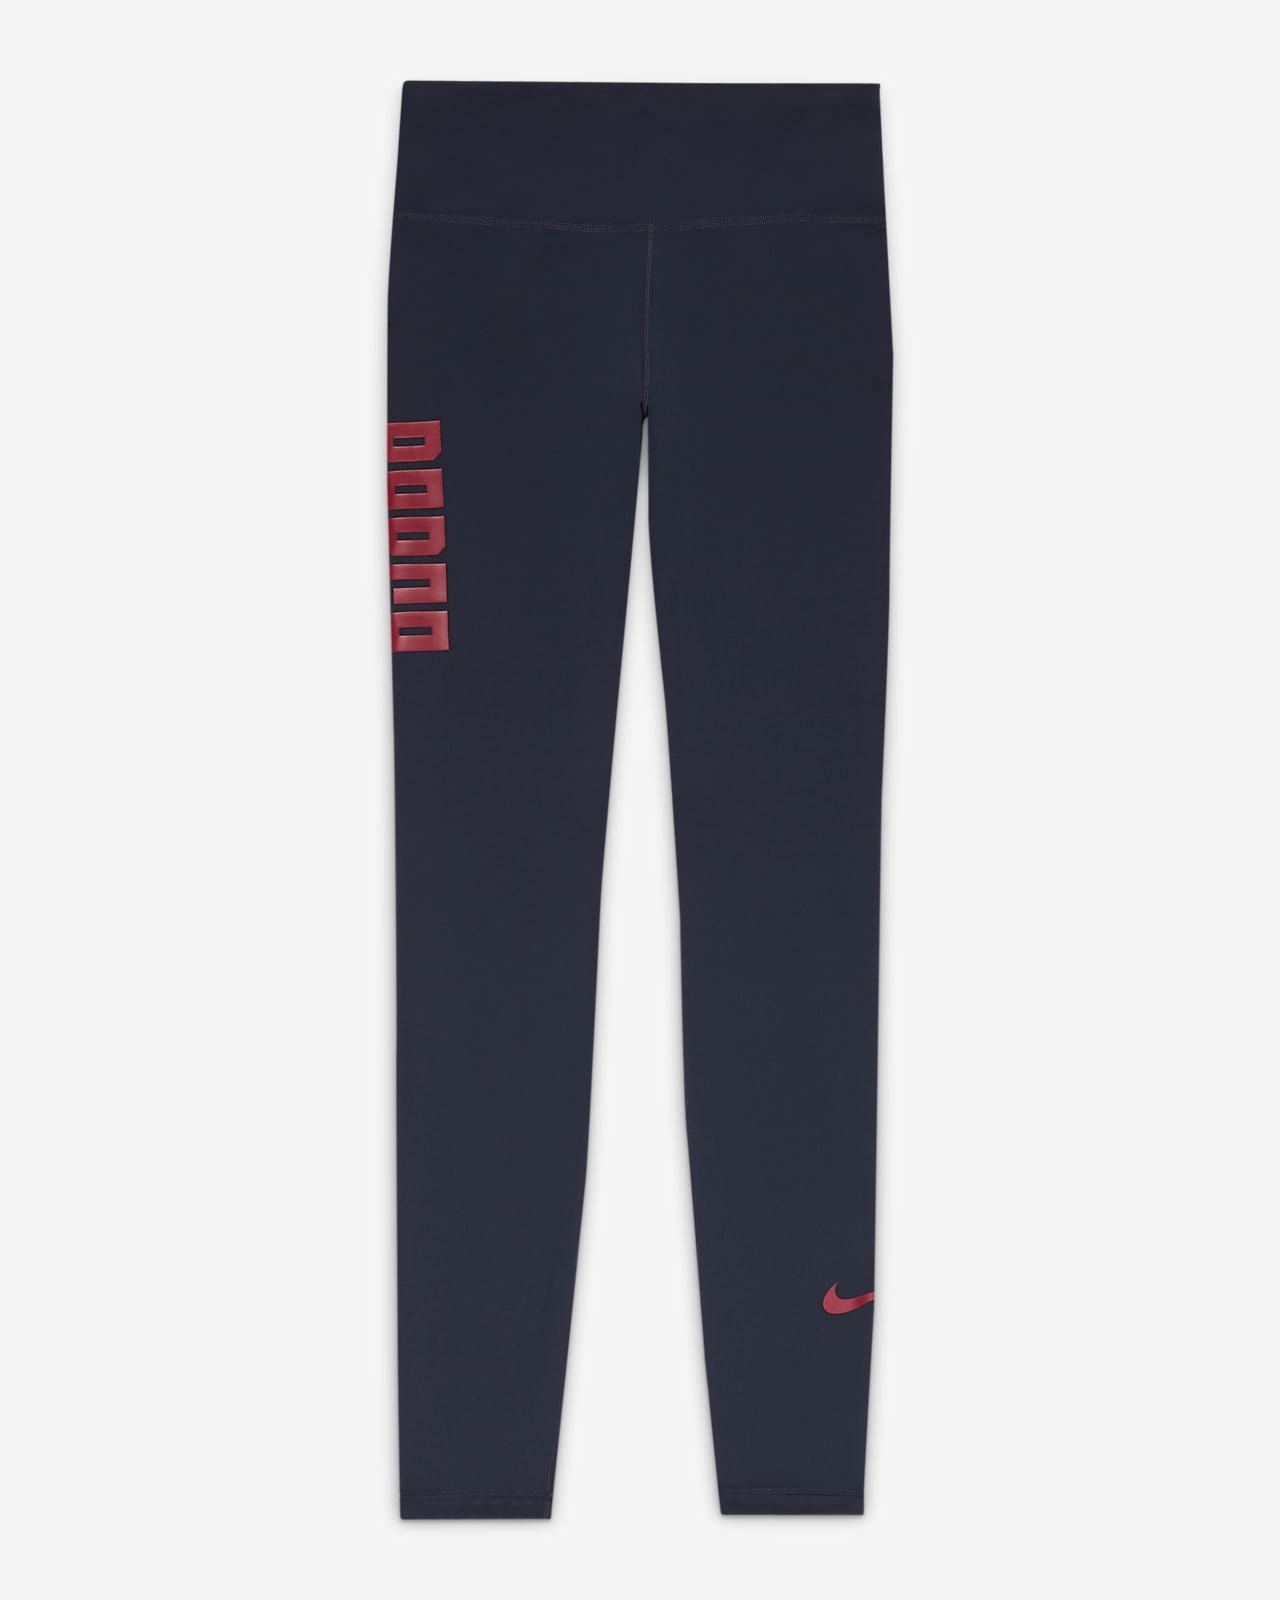 Leggings de cintura normal Nike One FC Barcelona para mulher